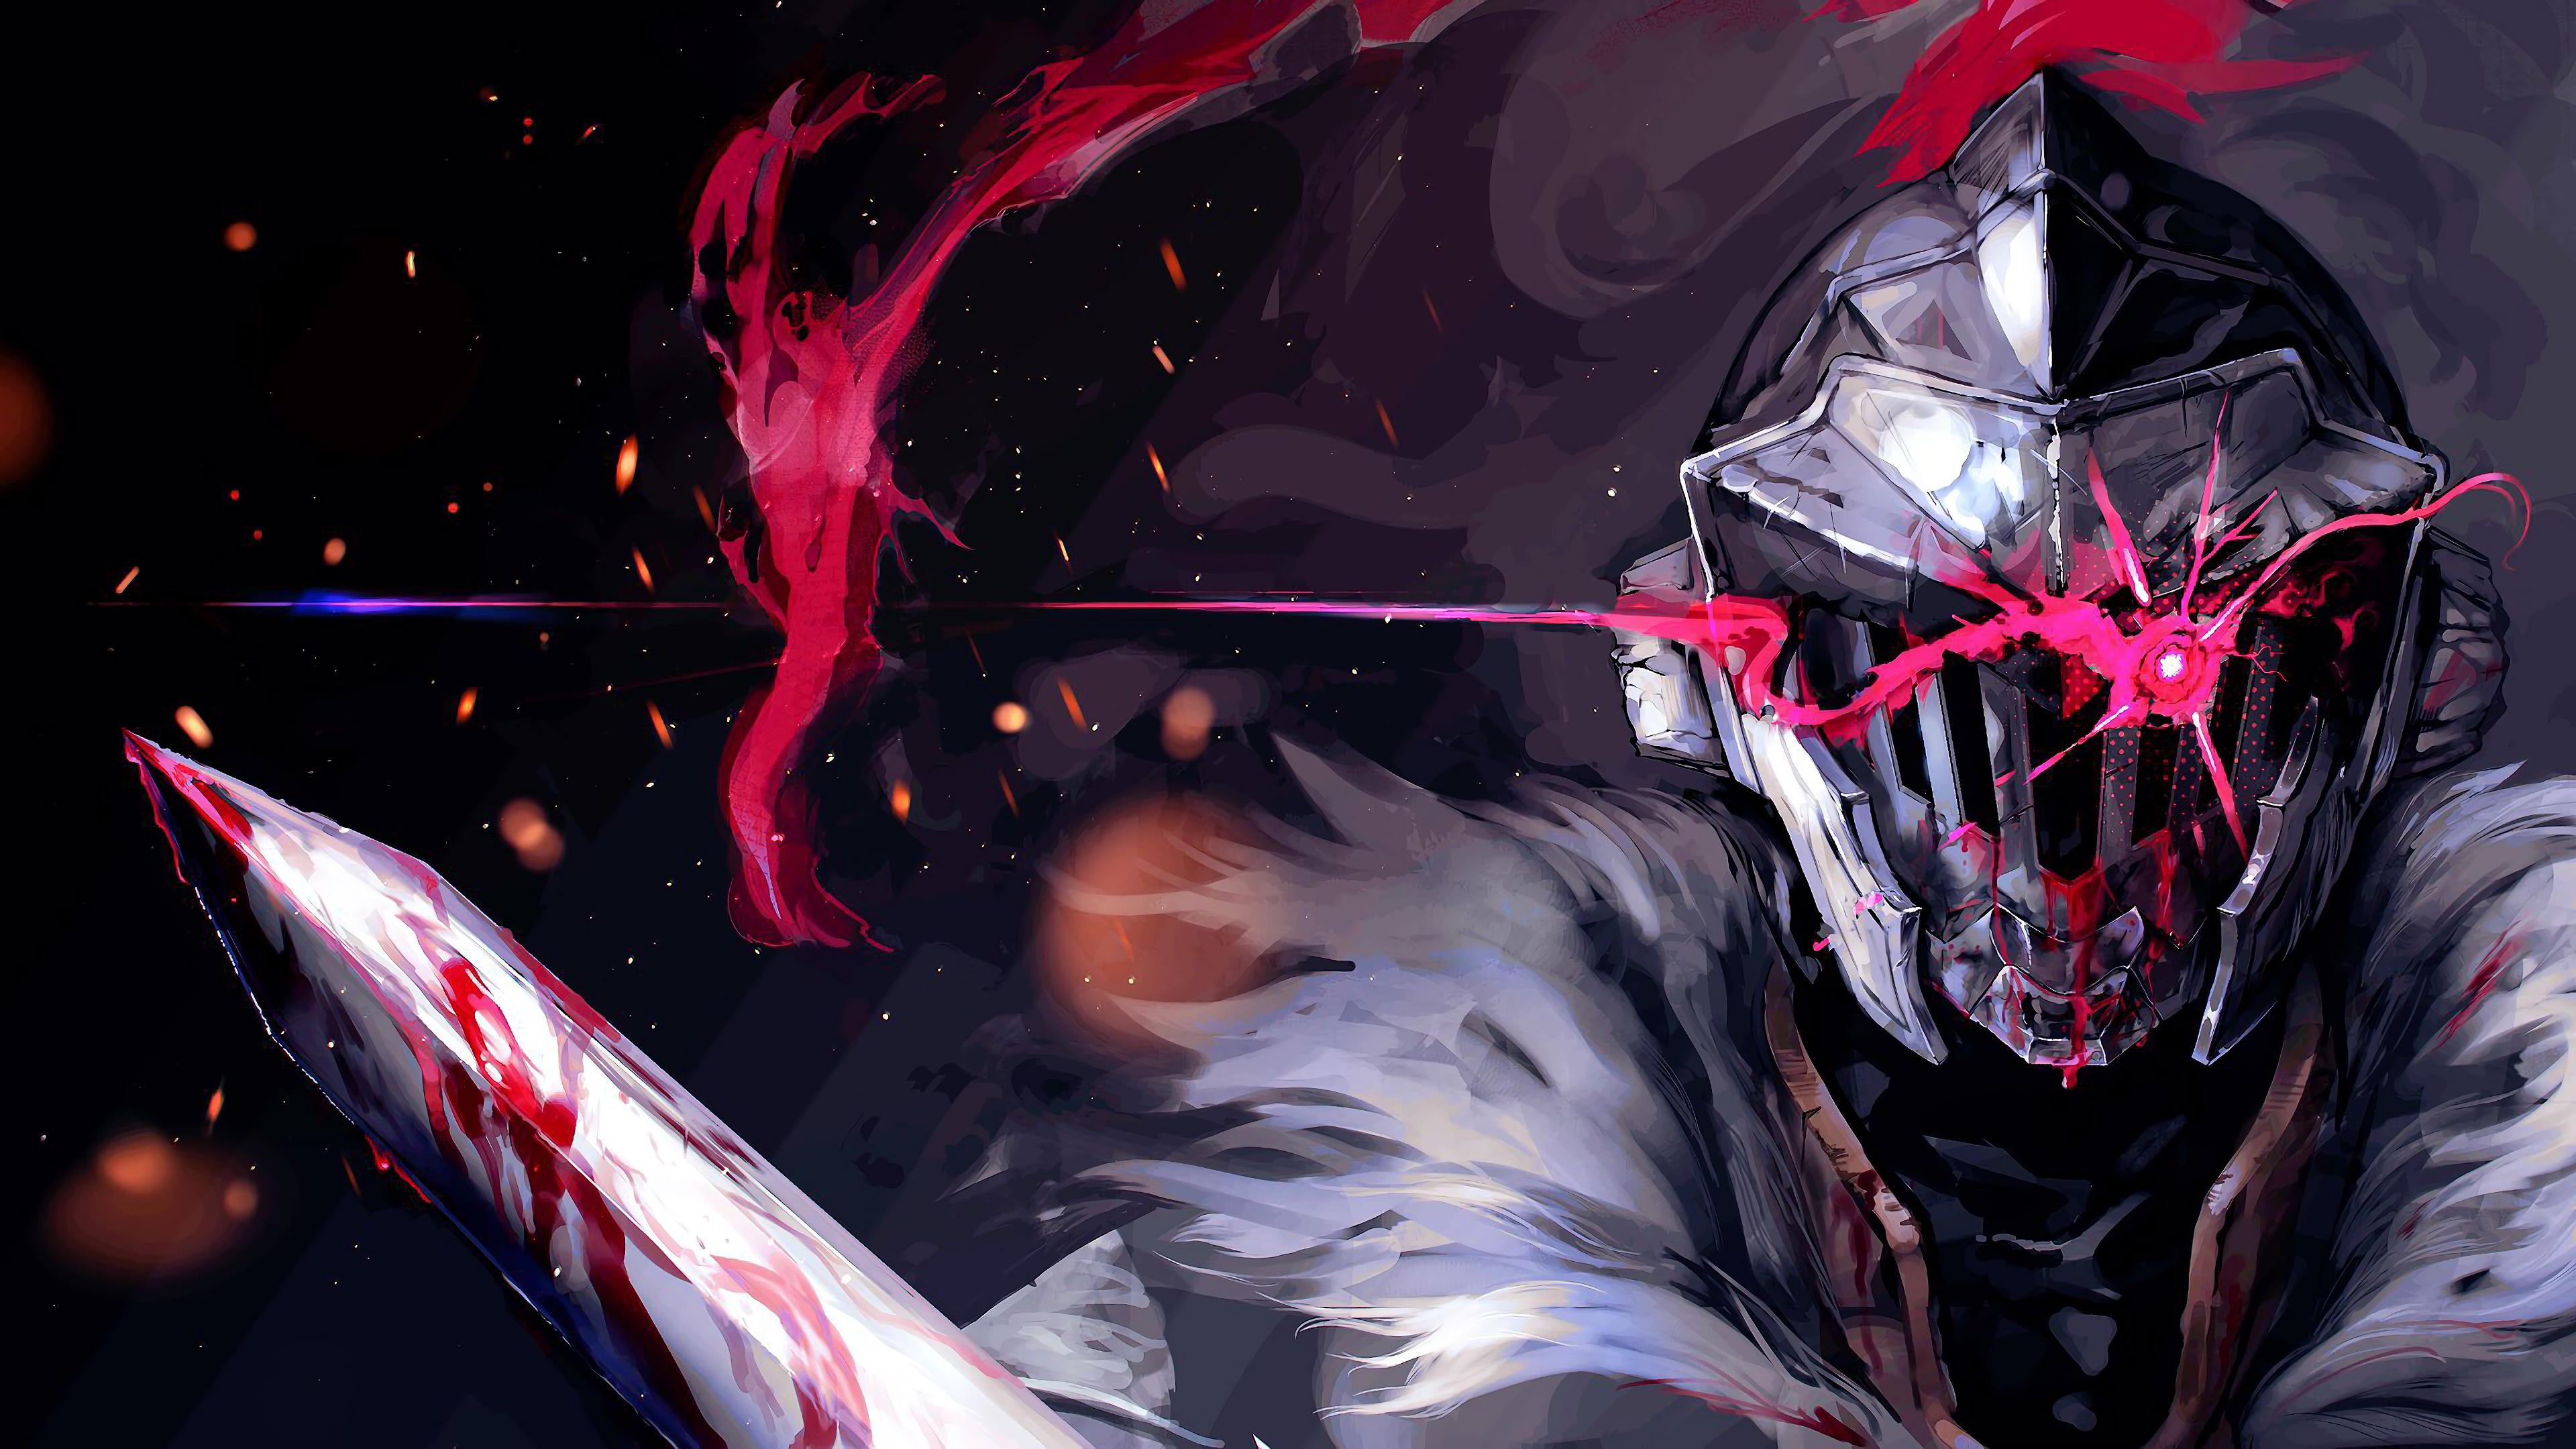 Free download Goblin Slayer Anime 4K 8K HD Wallpaper 3840x2160 for your Desktop, Mobile ...